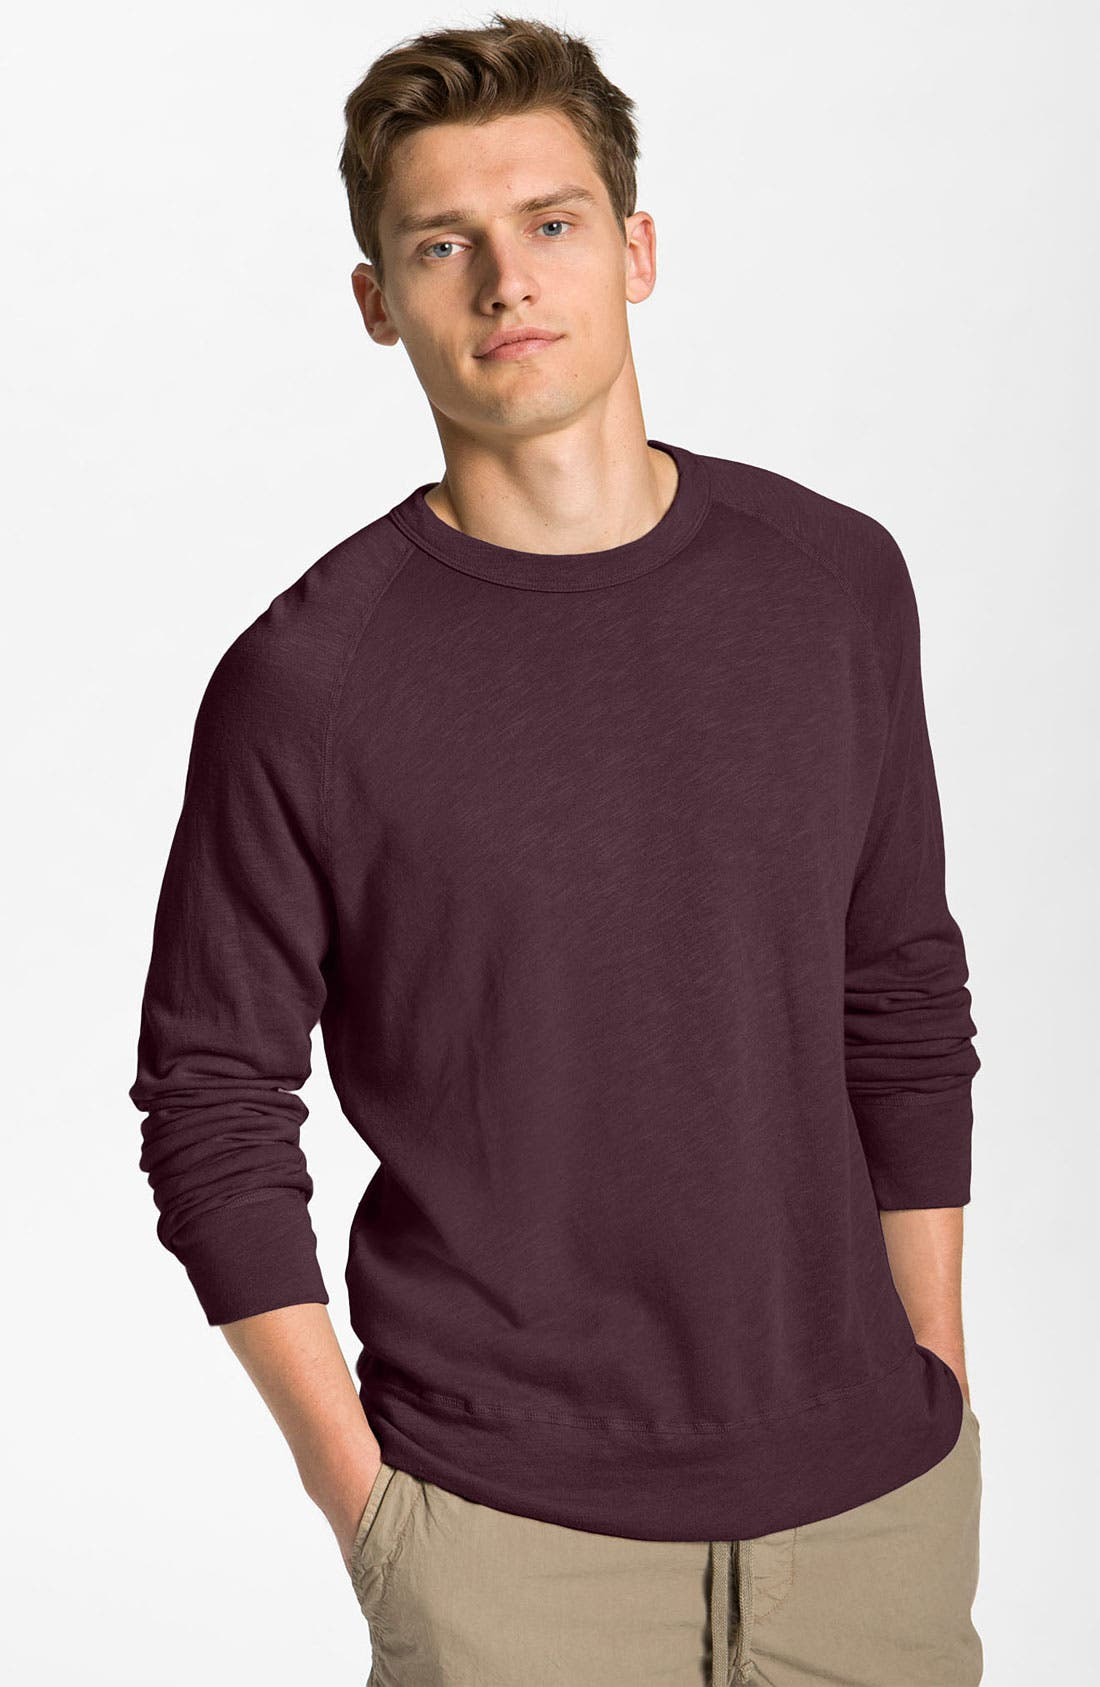 Alternate Image 1 Selected - James Perse Crewneck Sweatshirt